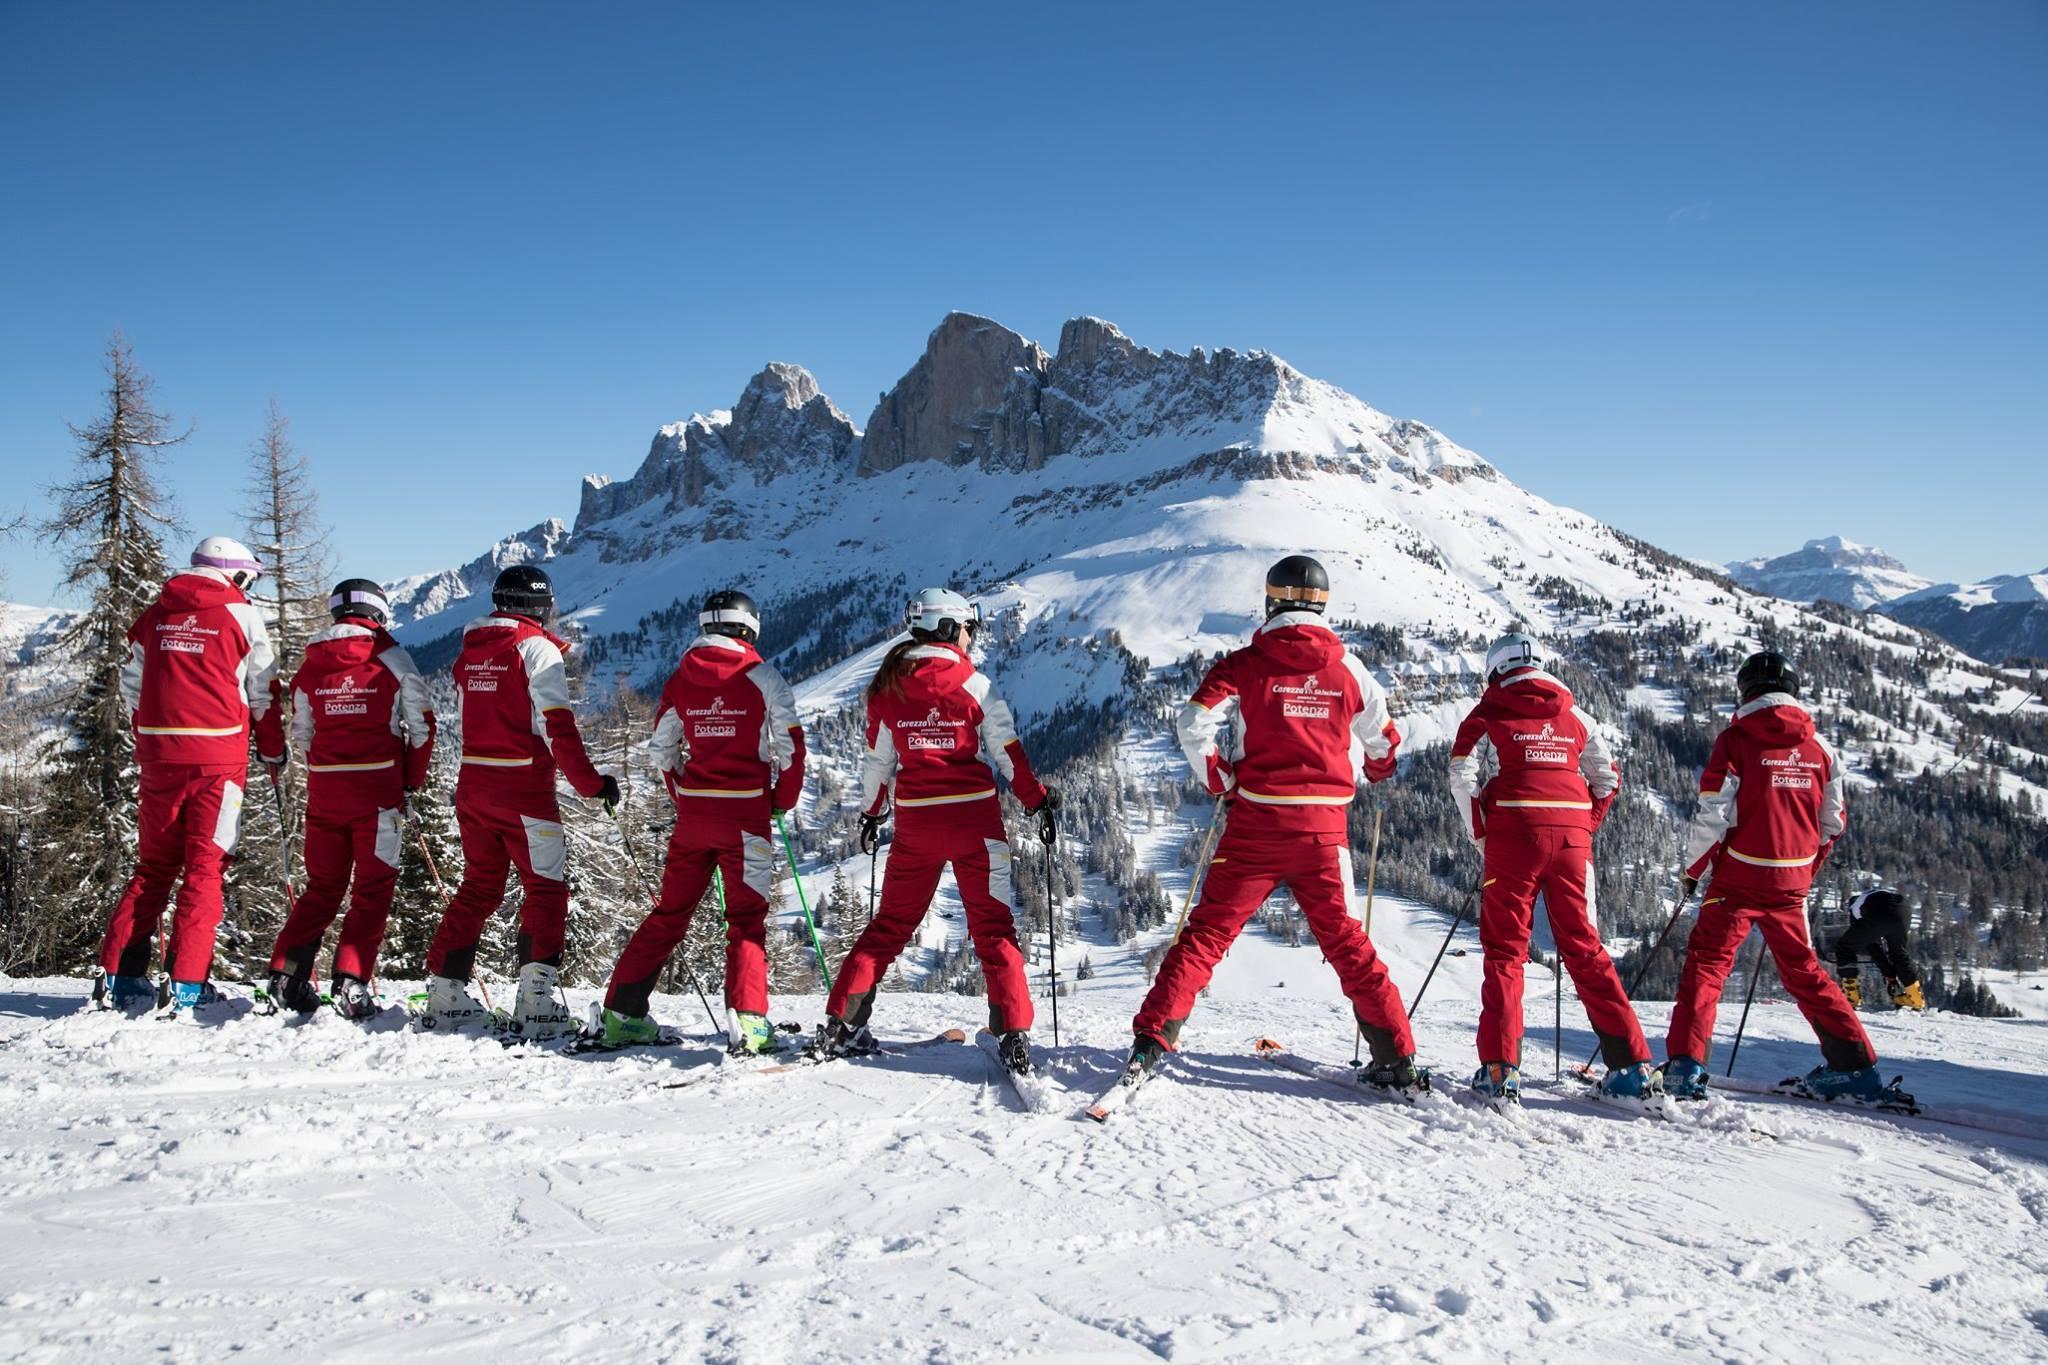 Ski Lessons for Adults - Beginner